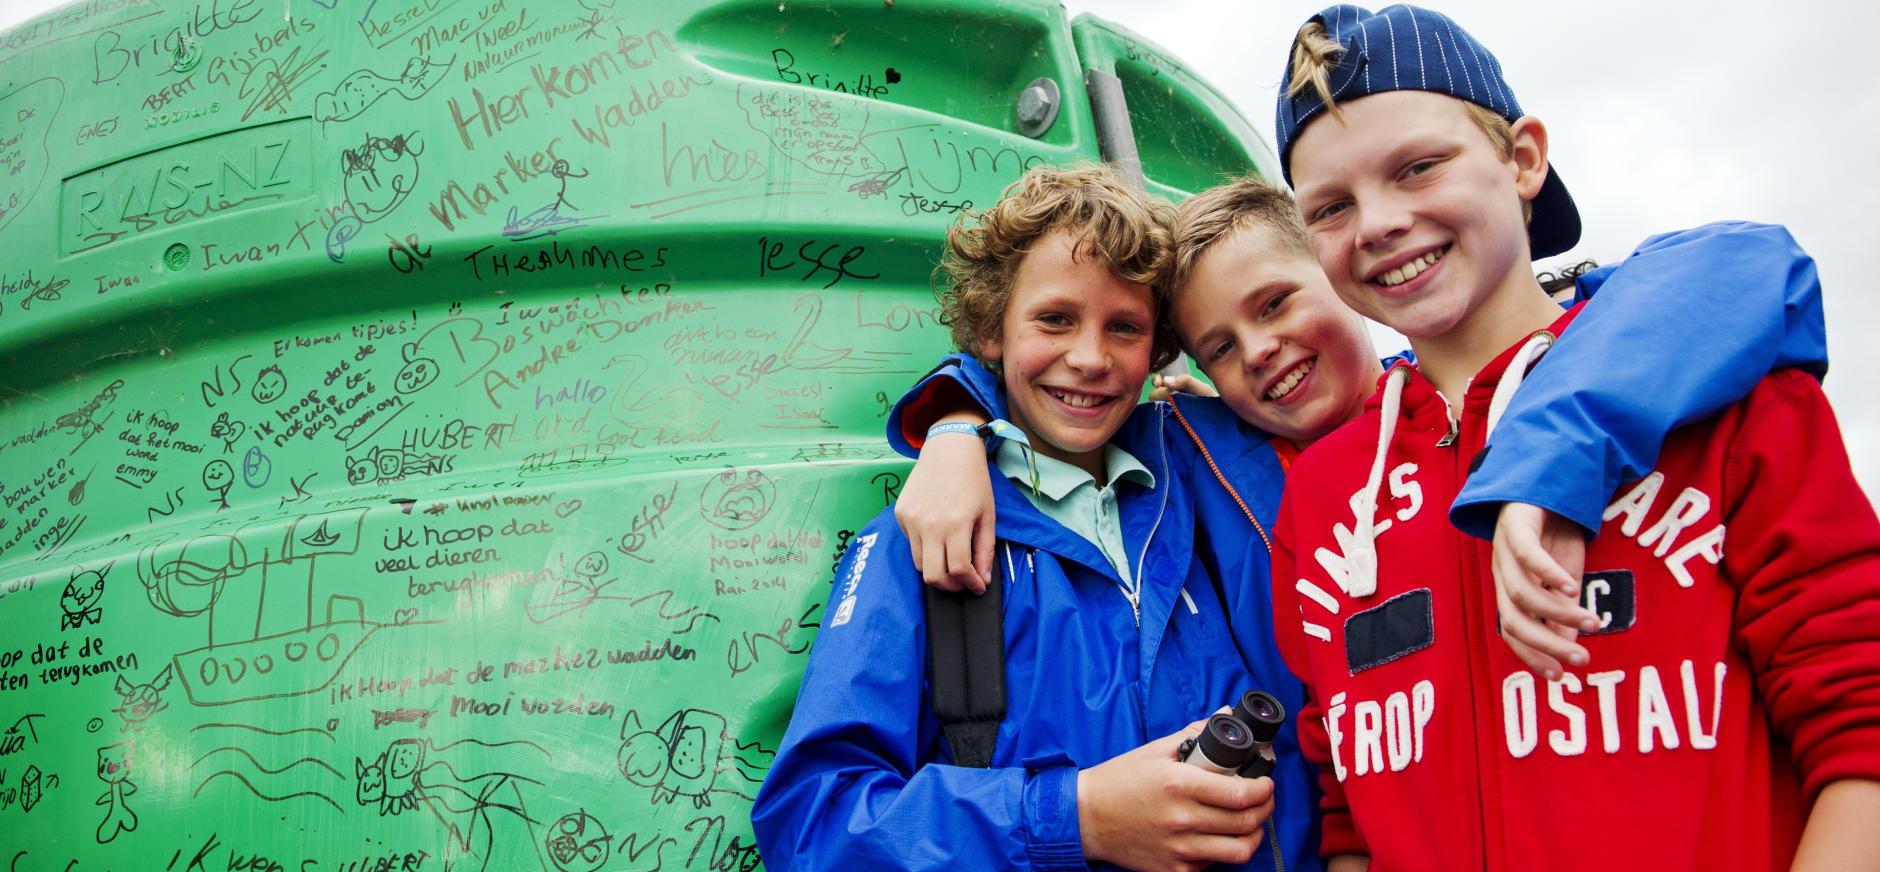 Kinderen Lelystad markeren Marker Wadden